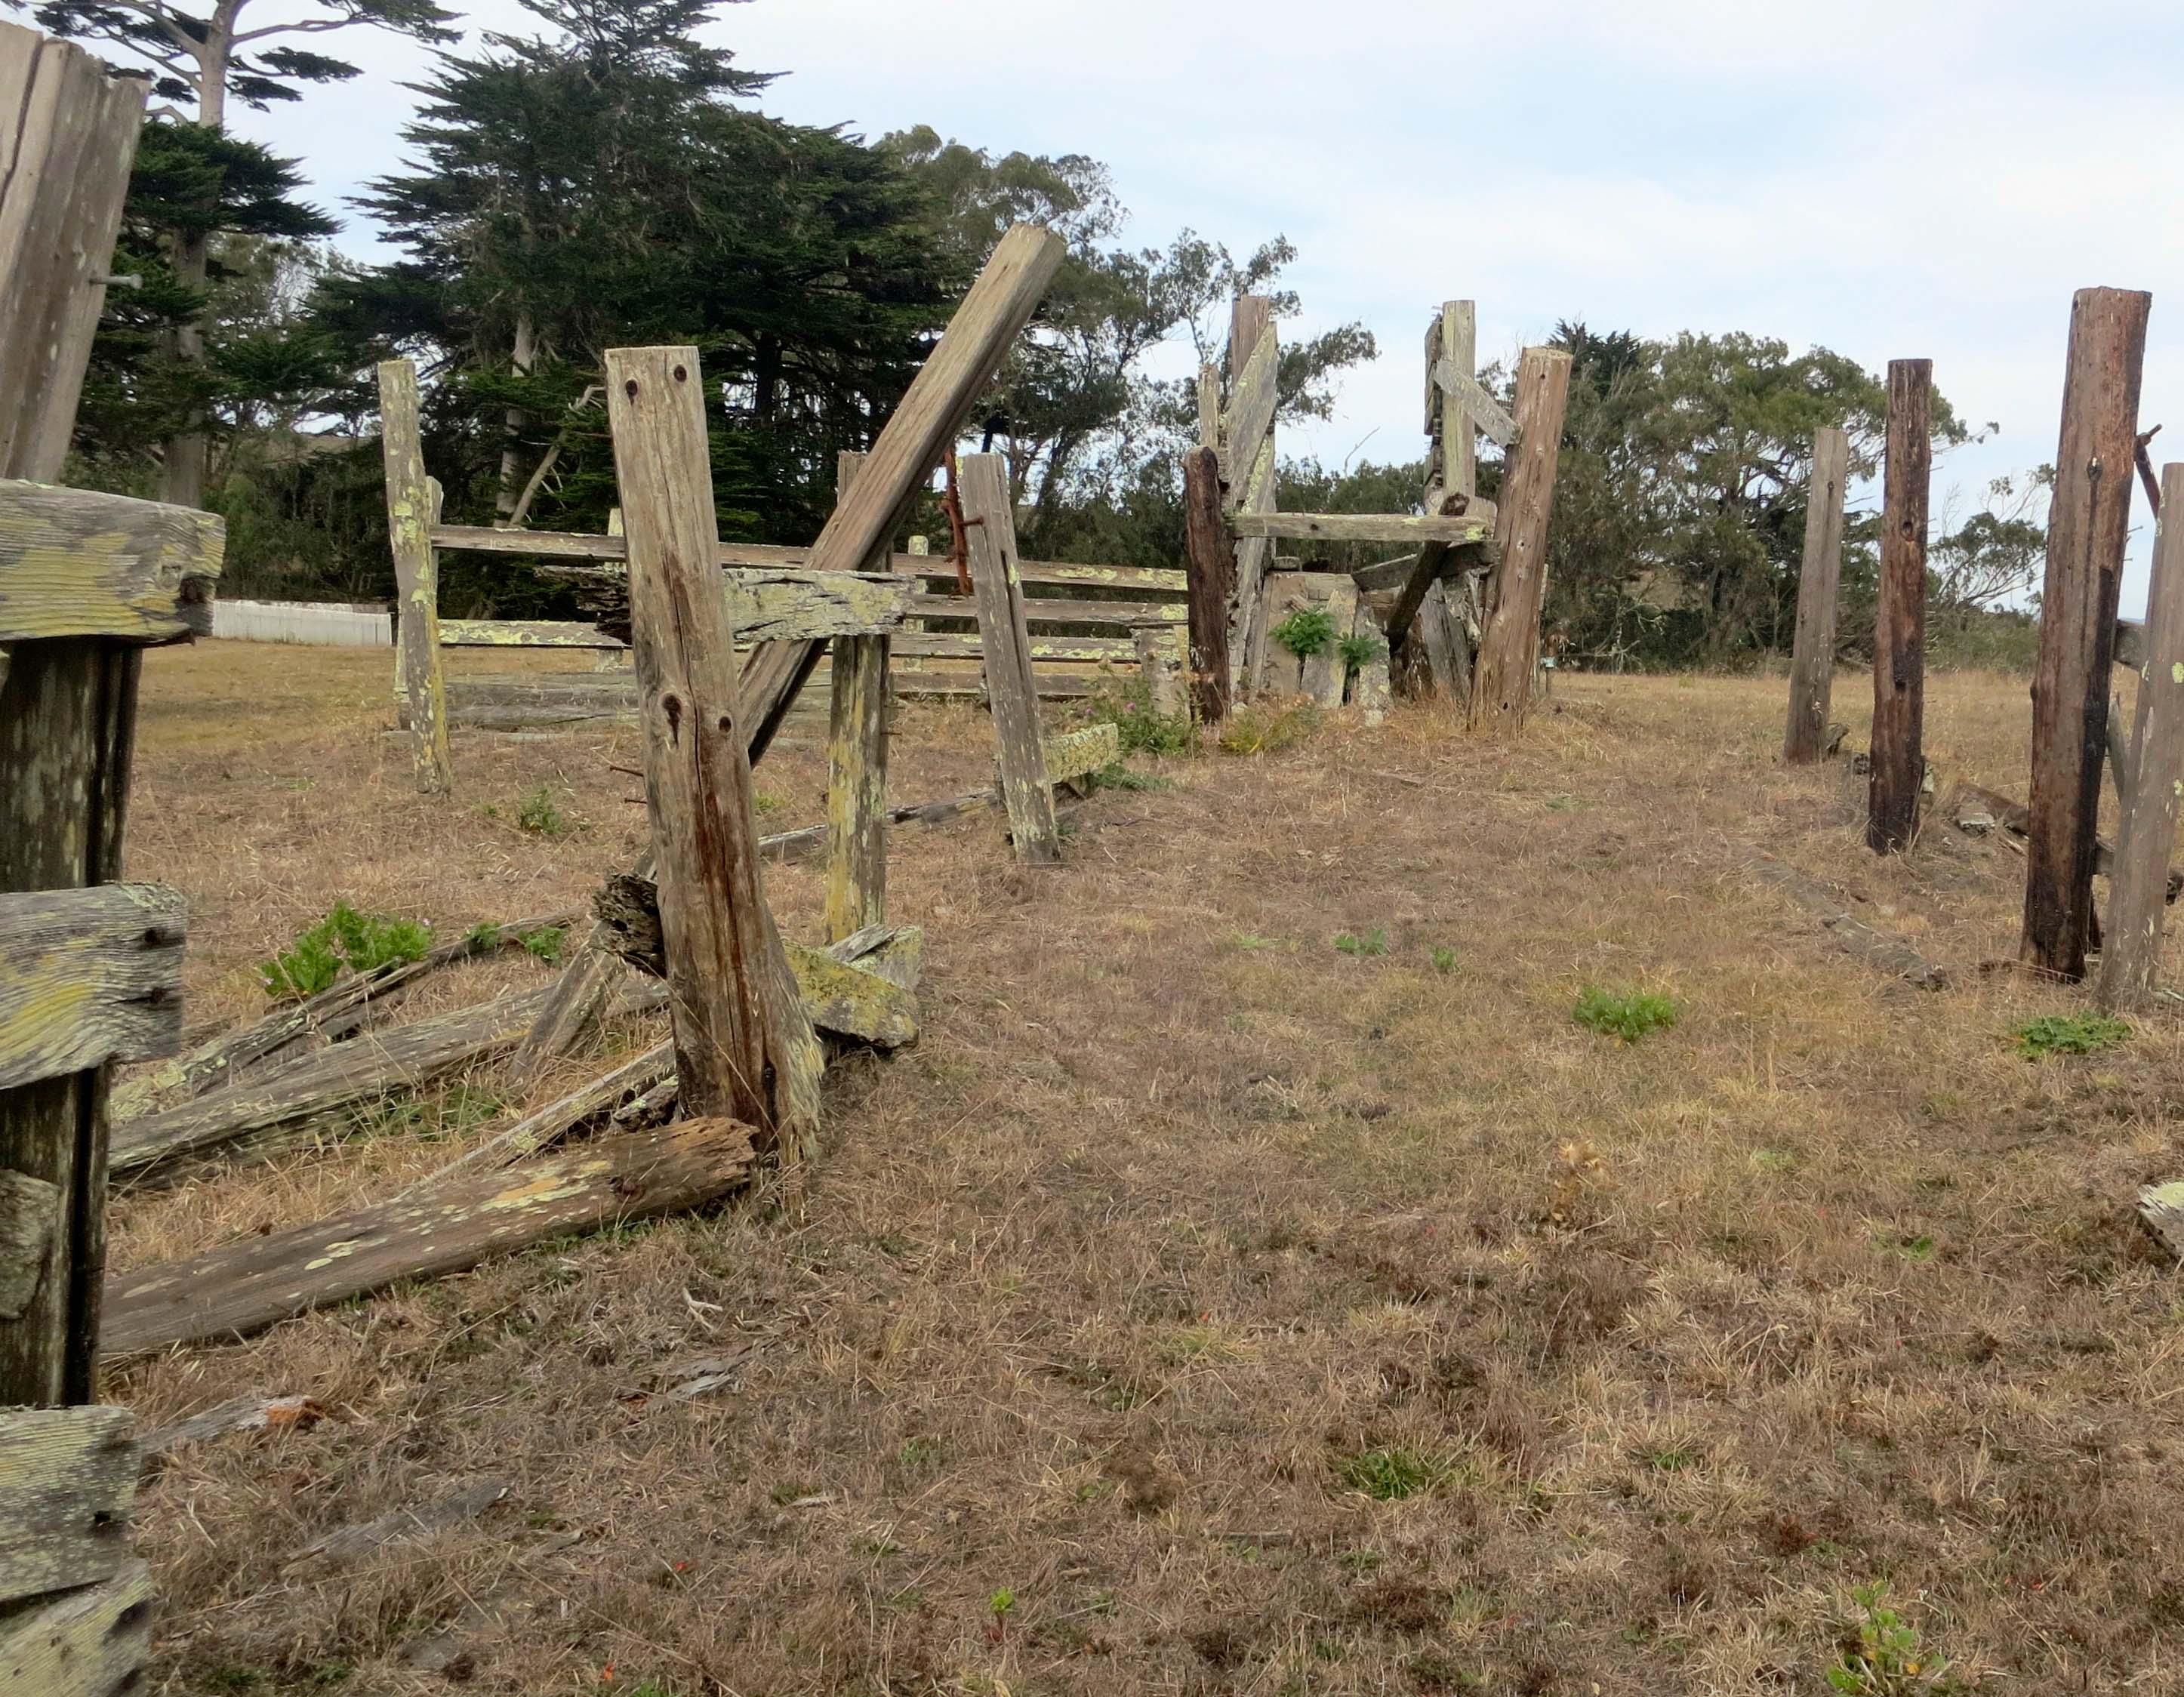 Old cattle pen at Pierce Ranch at Pt. Reyes National Seashore. Photo by Curtis Mekemson.